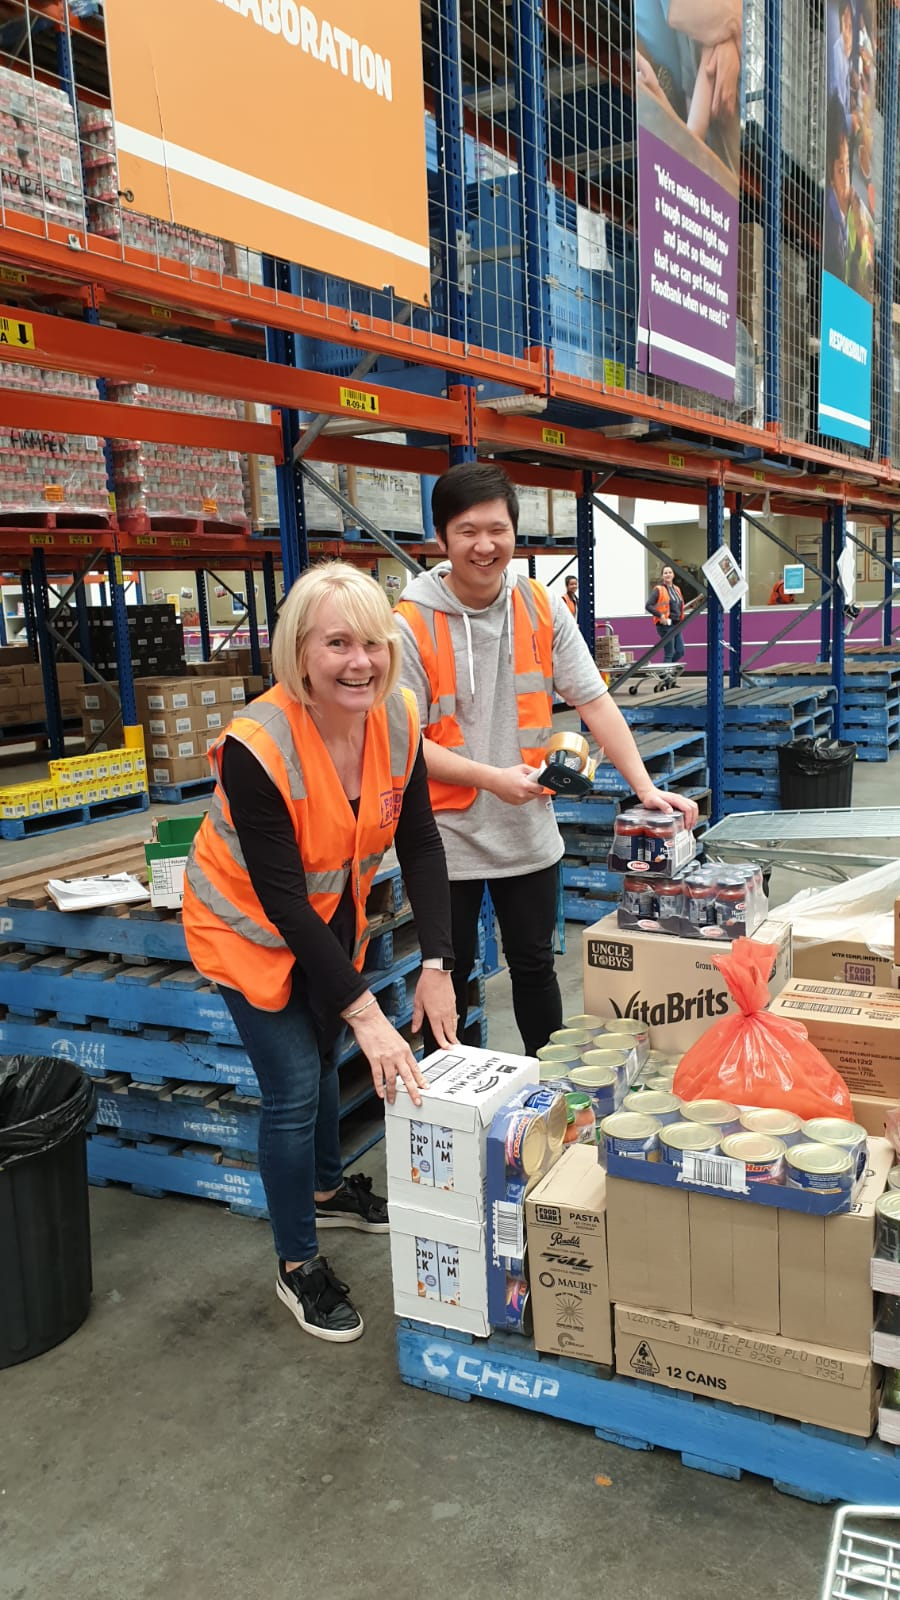 Foodbank volunteering